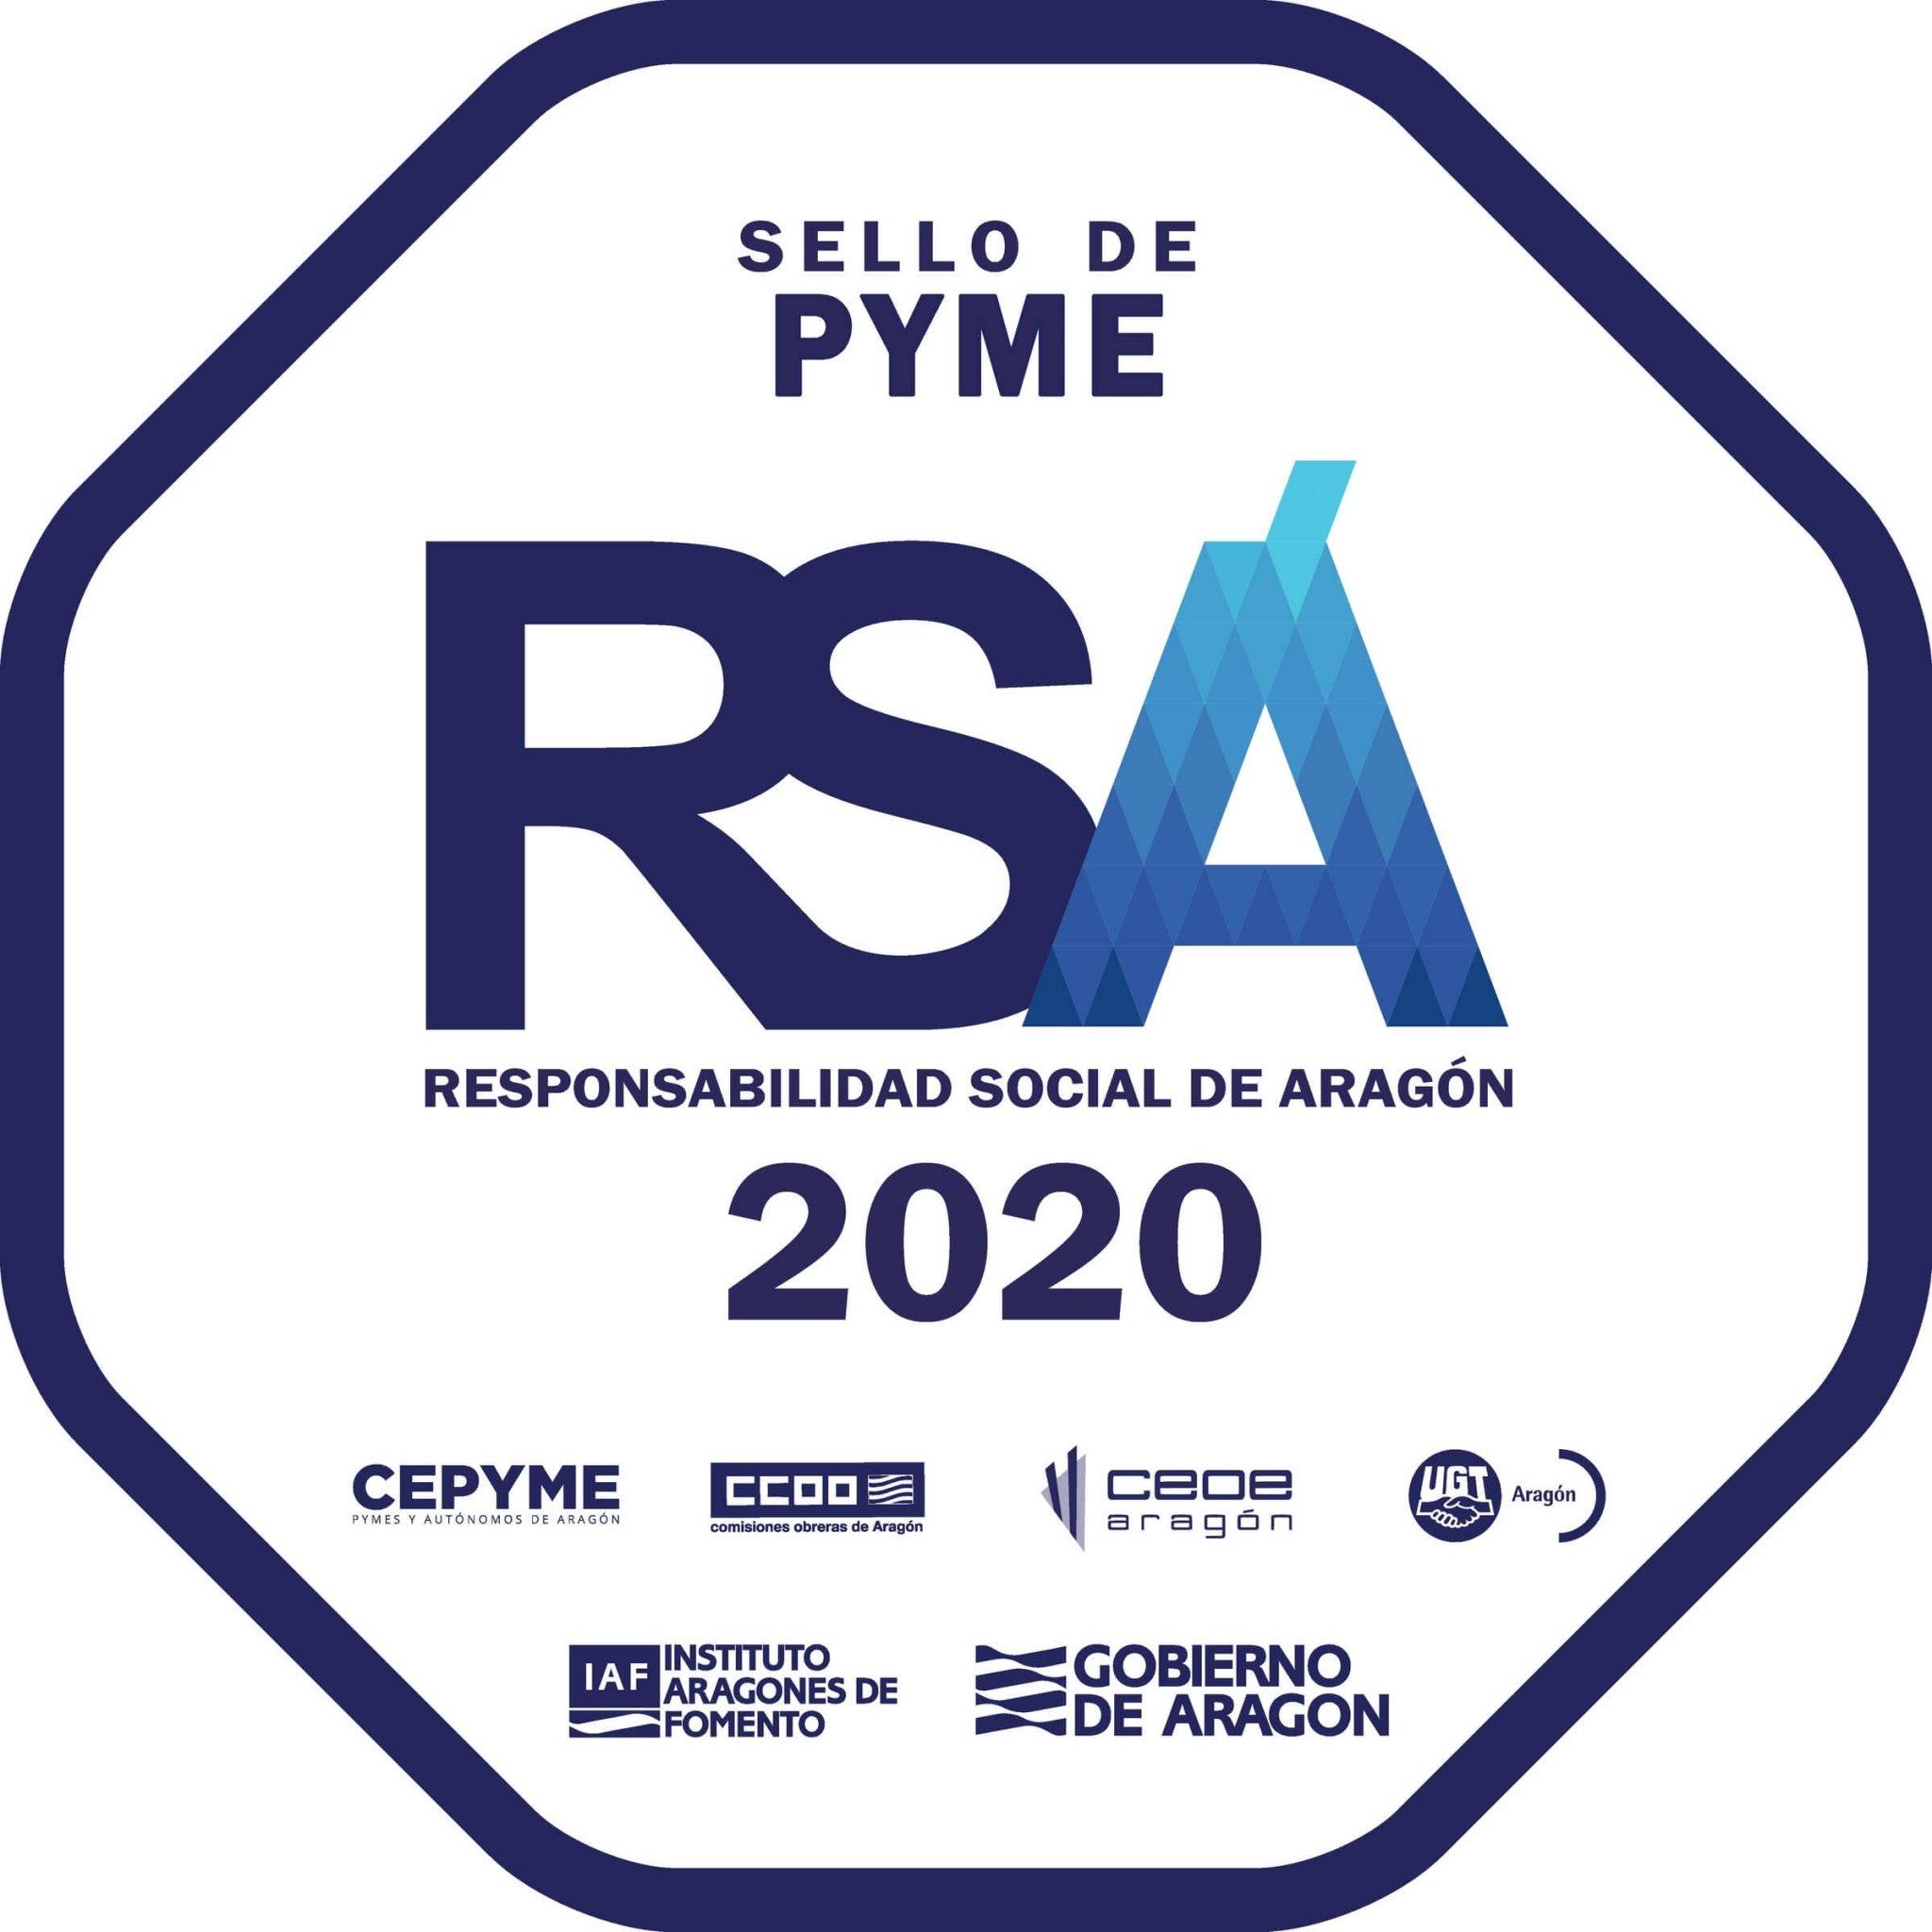 Seññp RSA 2020 peig ganadera